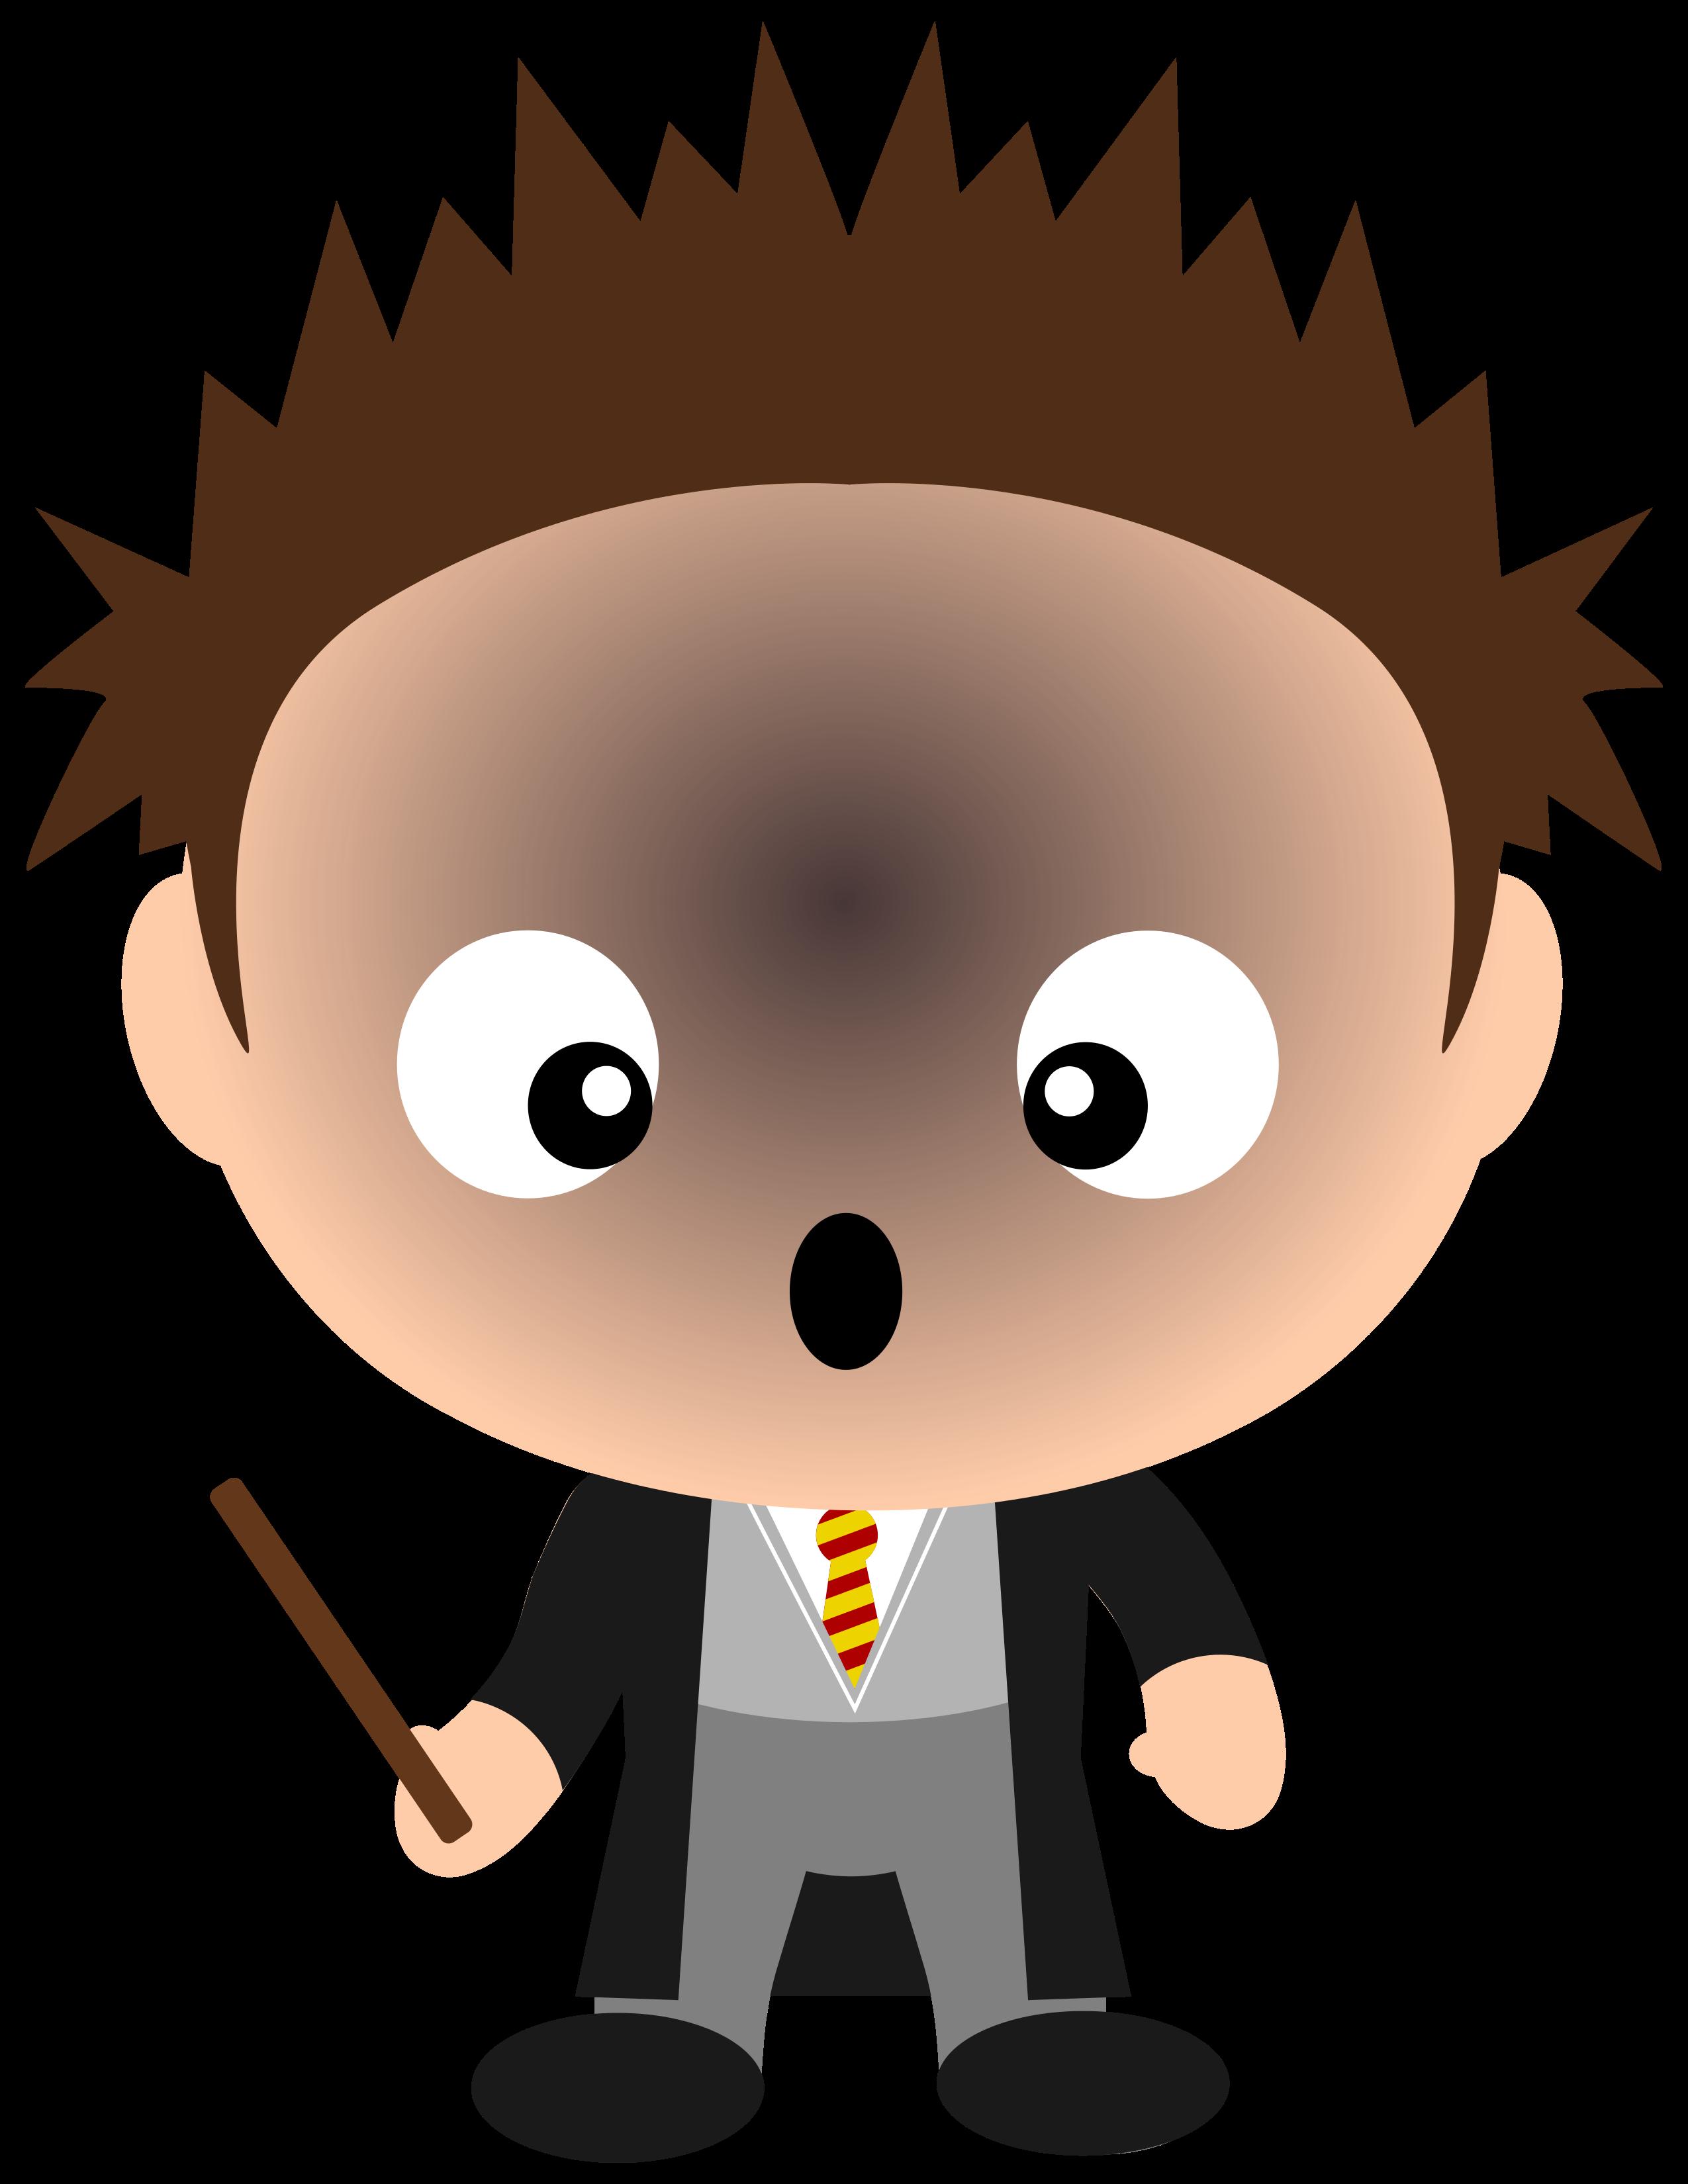 Harry Potter Clipart - Alastor Moody, Bellatrix Lestrange ...